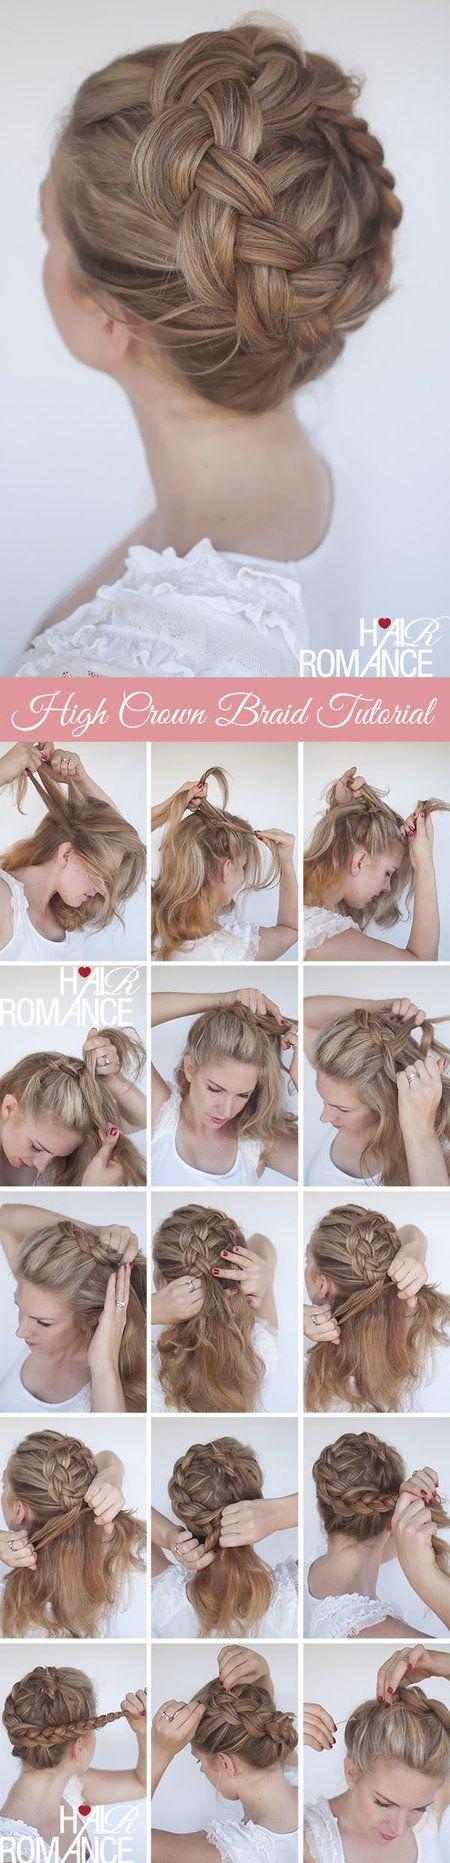 http://www.hairromance.com/2014/03/new-braid-tutorial-the-high-braided-crown-hairstyle.html